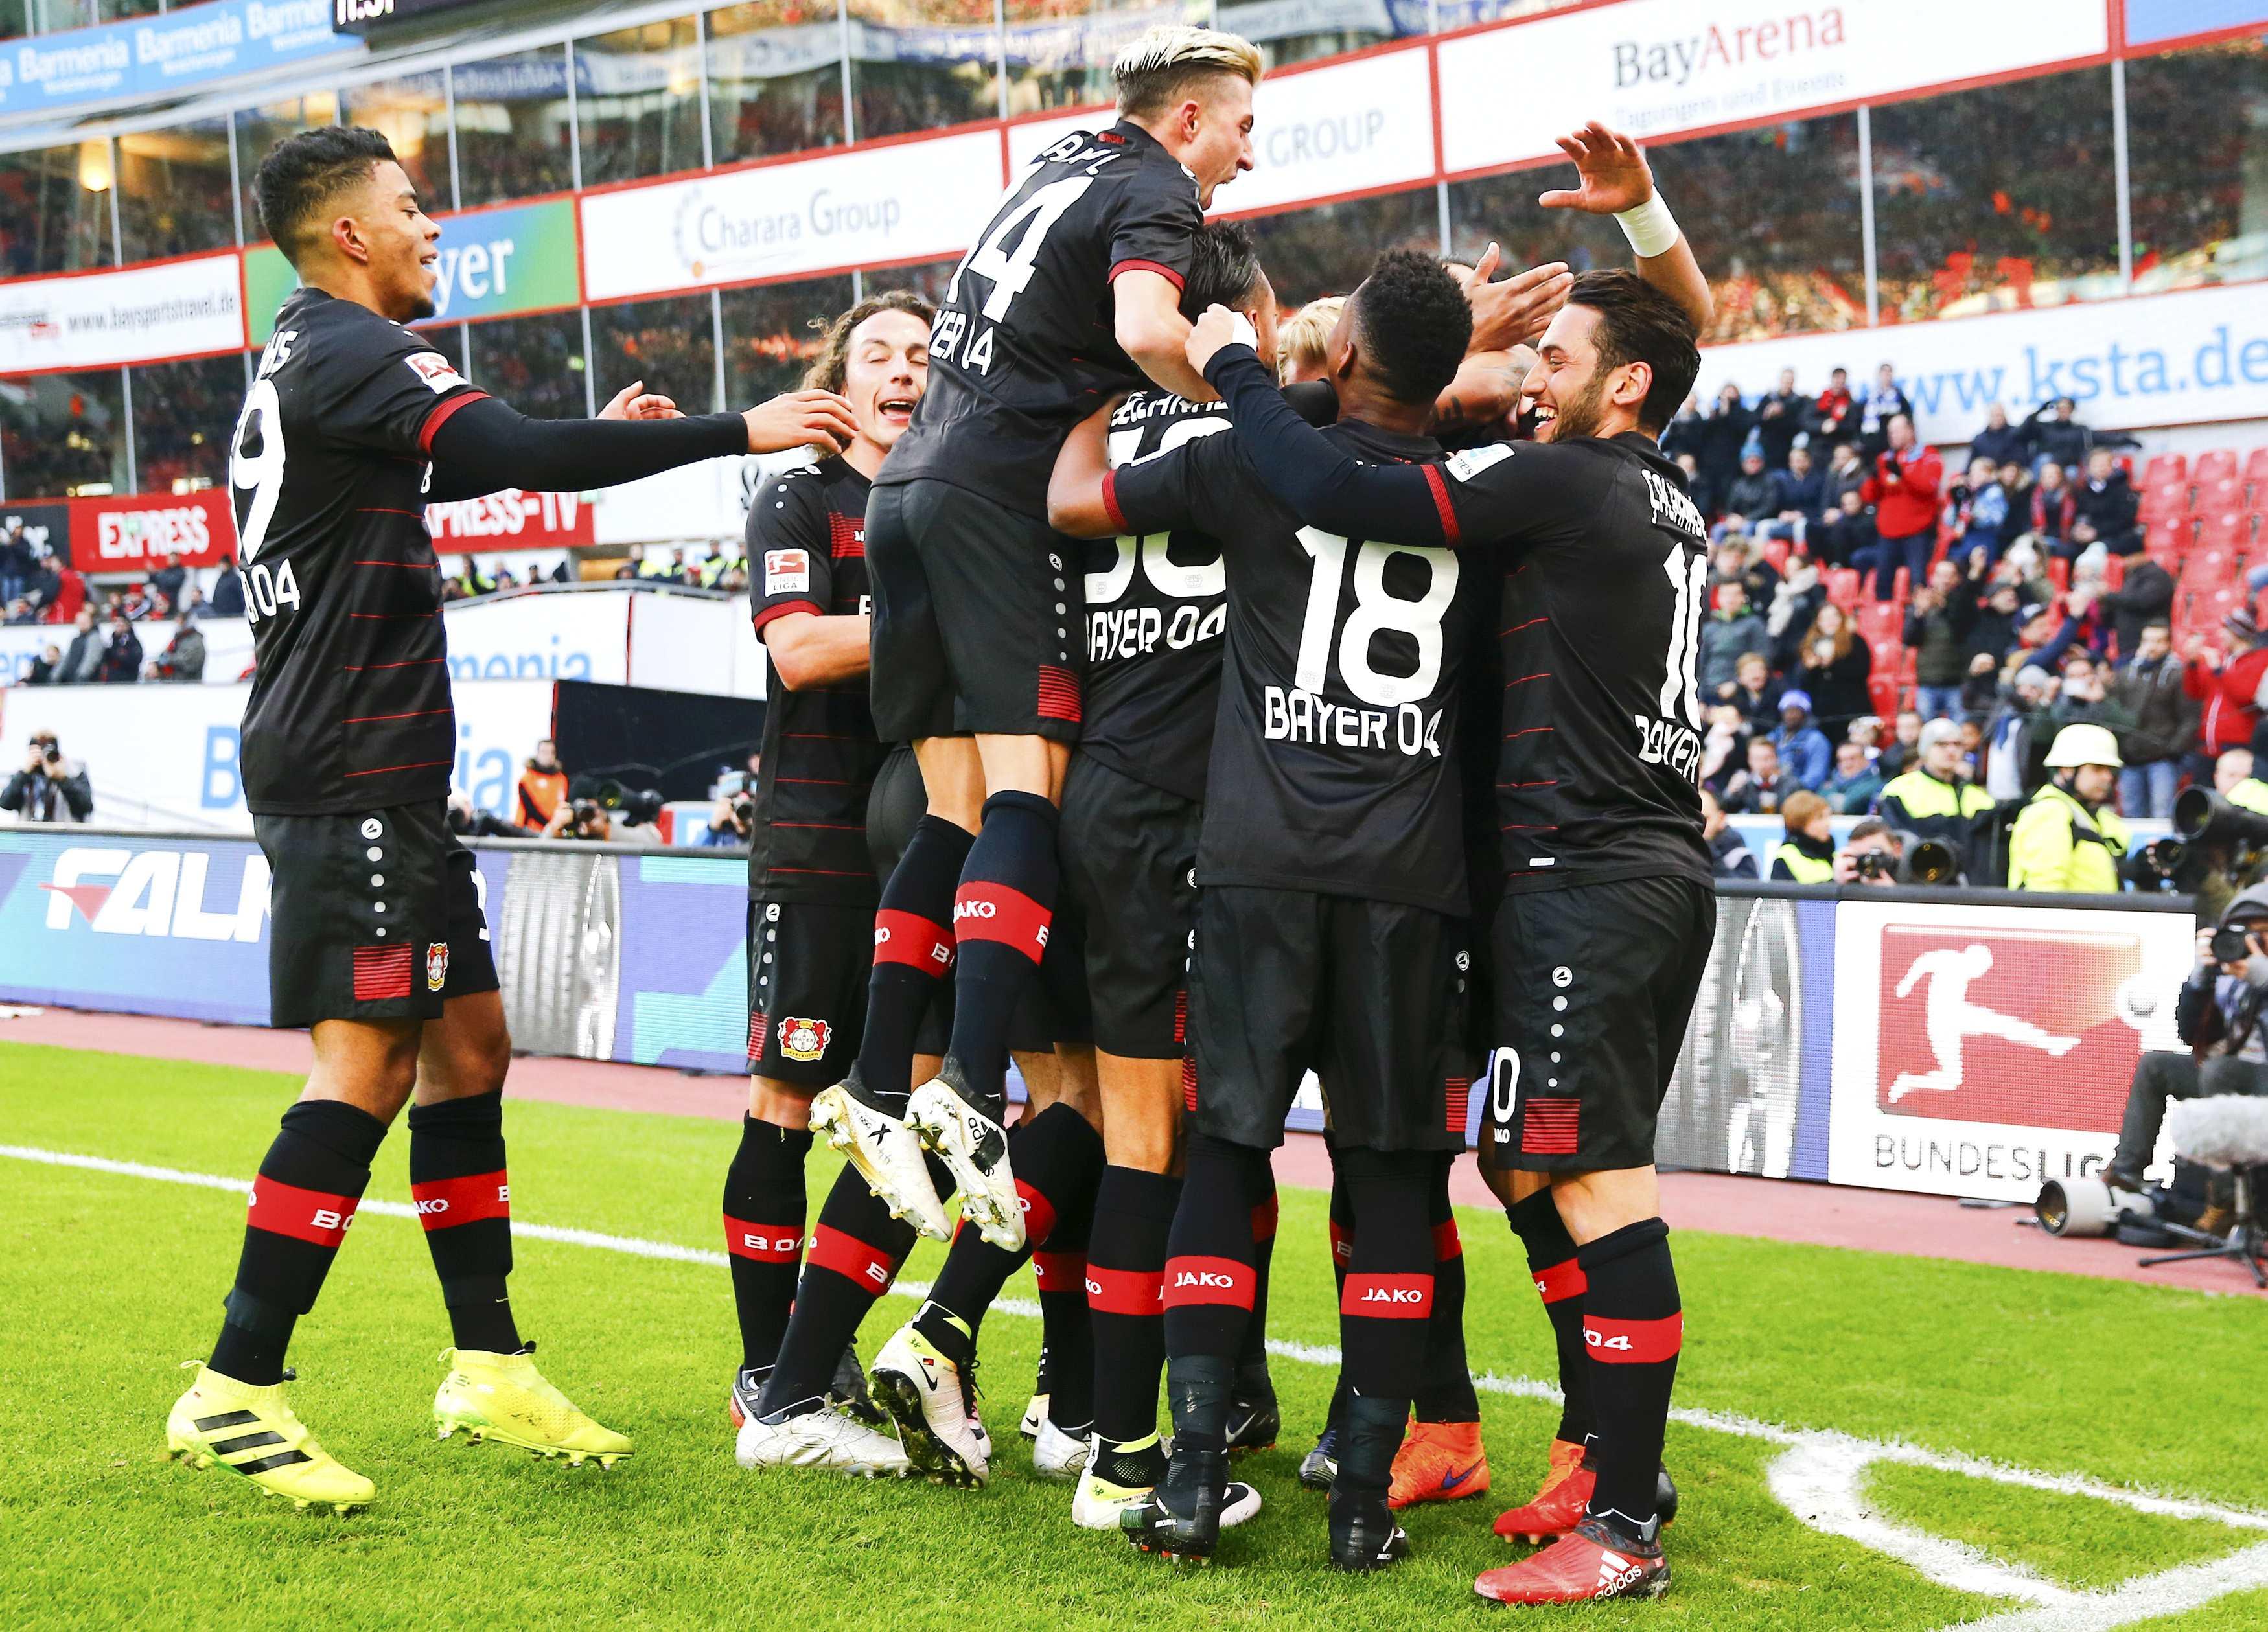 leverkusen players during a match against berlin photo reuters